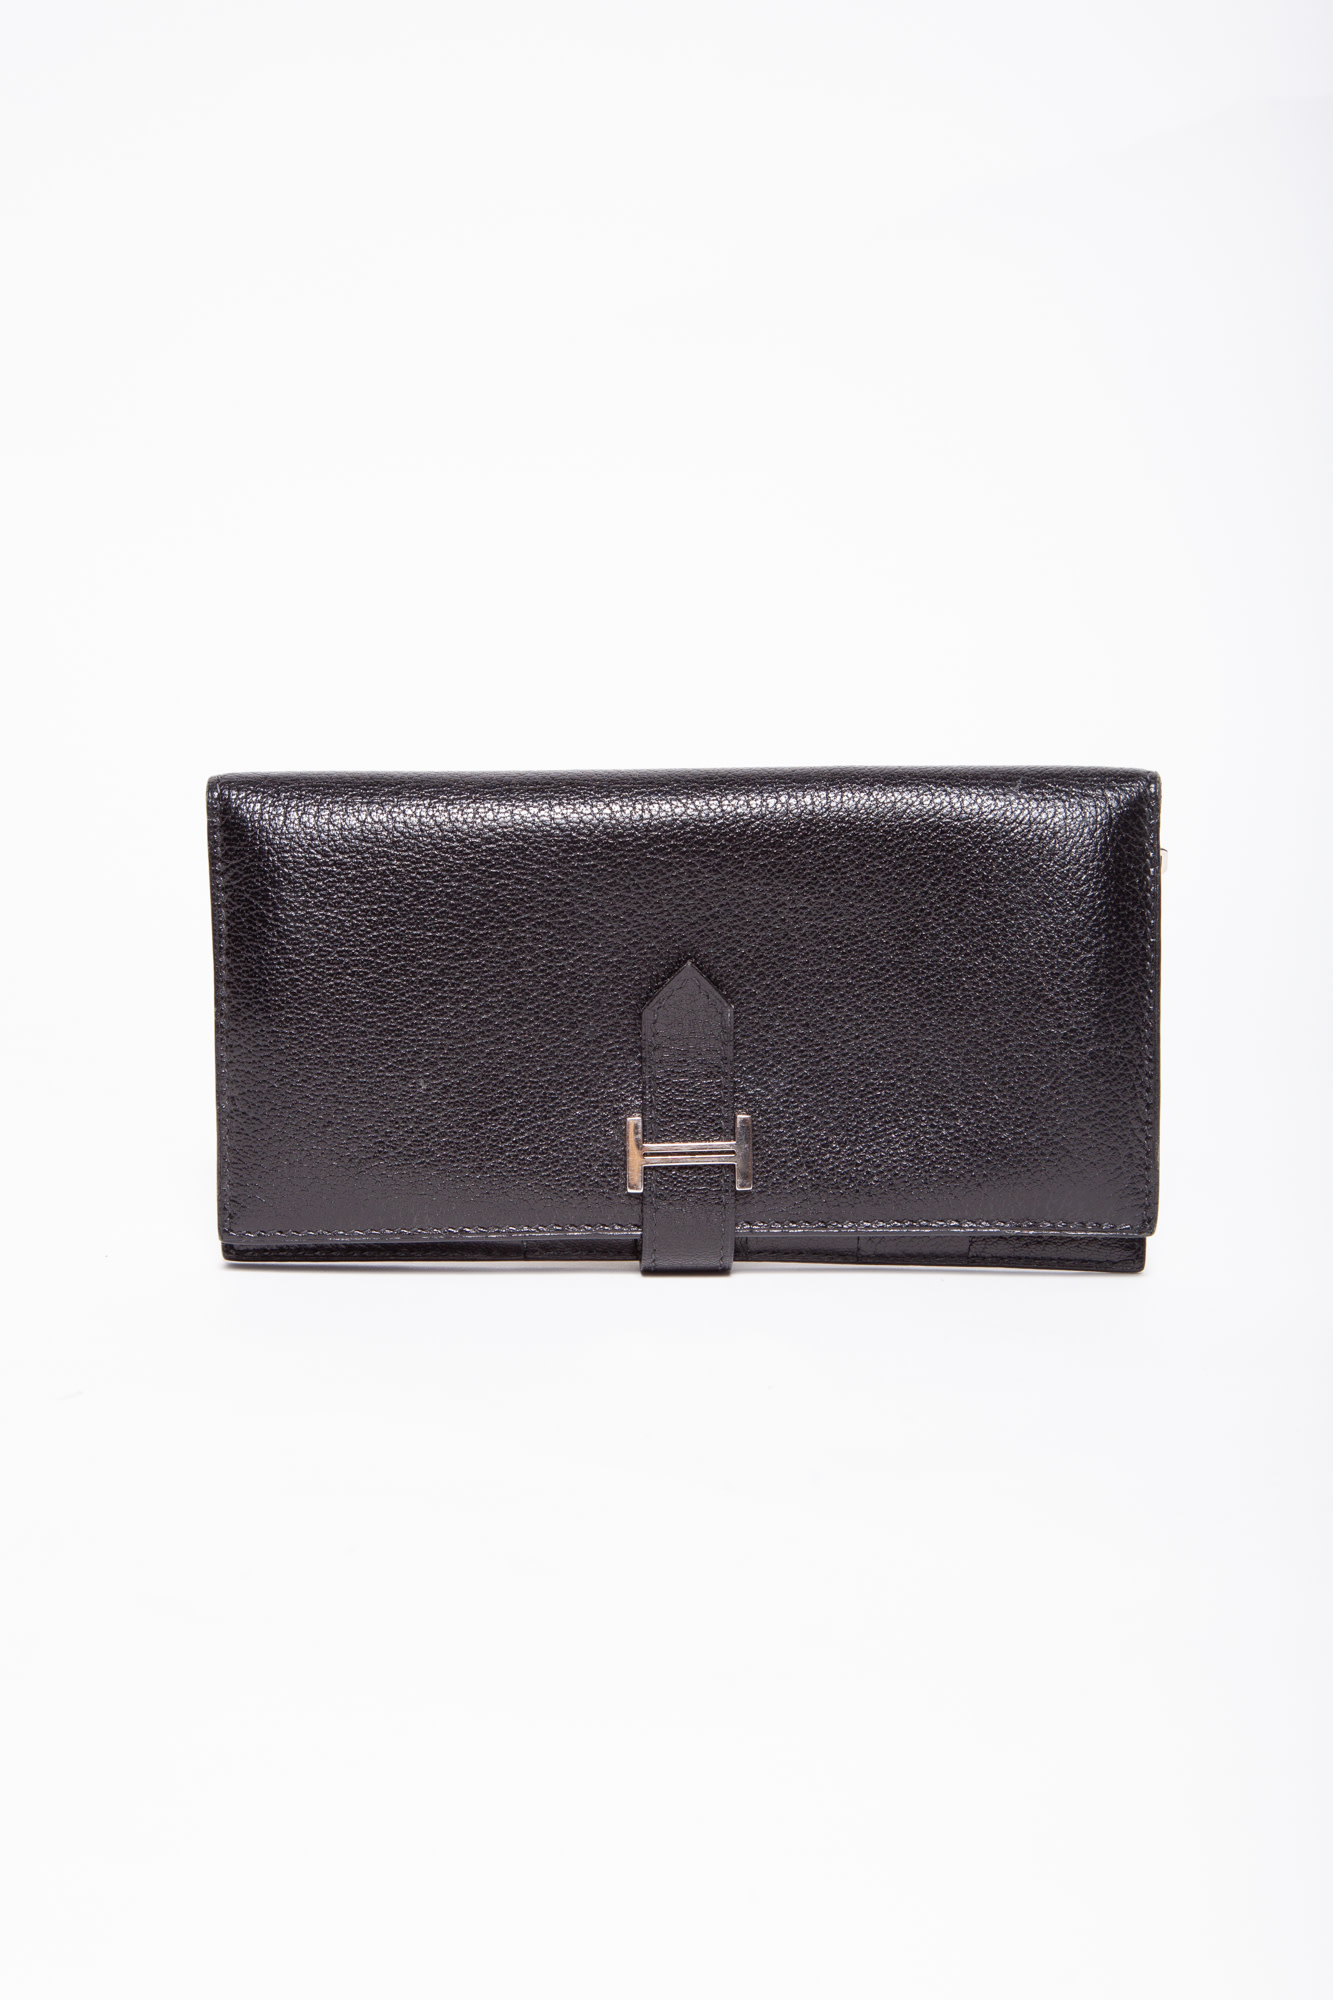 Hermès BÉARN BLACK LEATHER WALLET